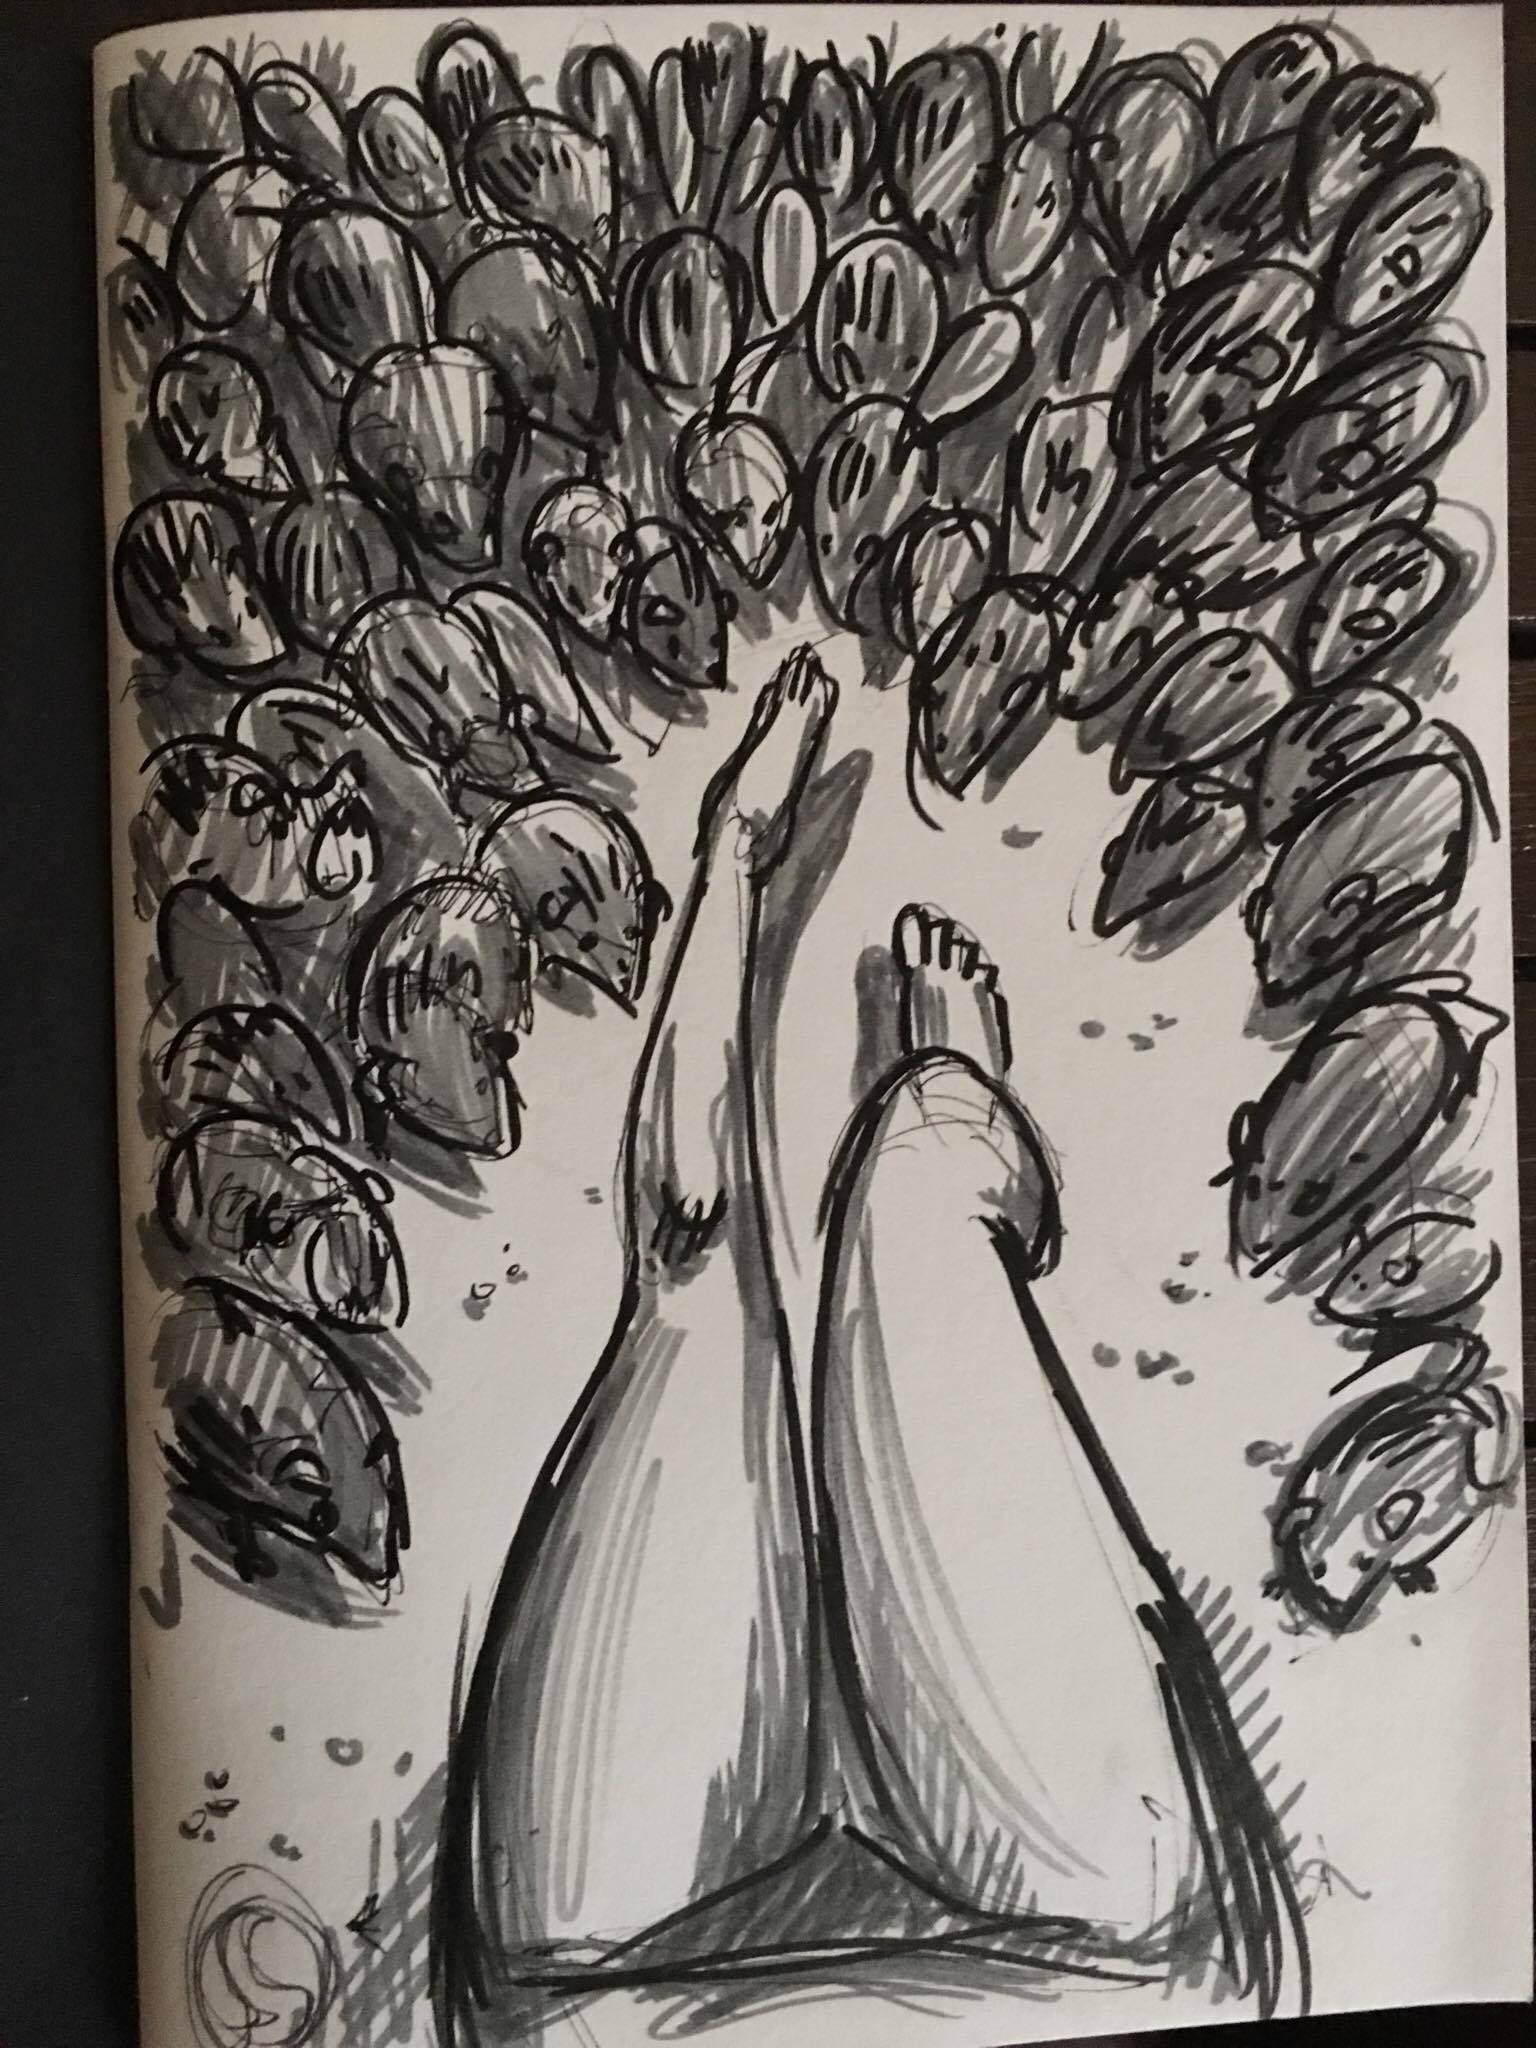 Dani Brown 'Broccoli' Sketch